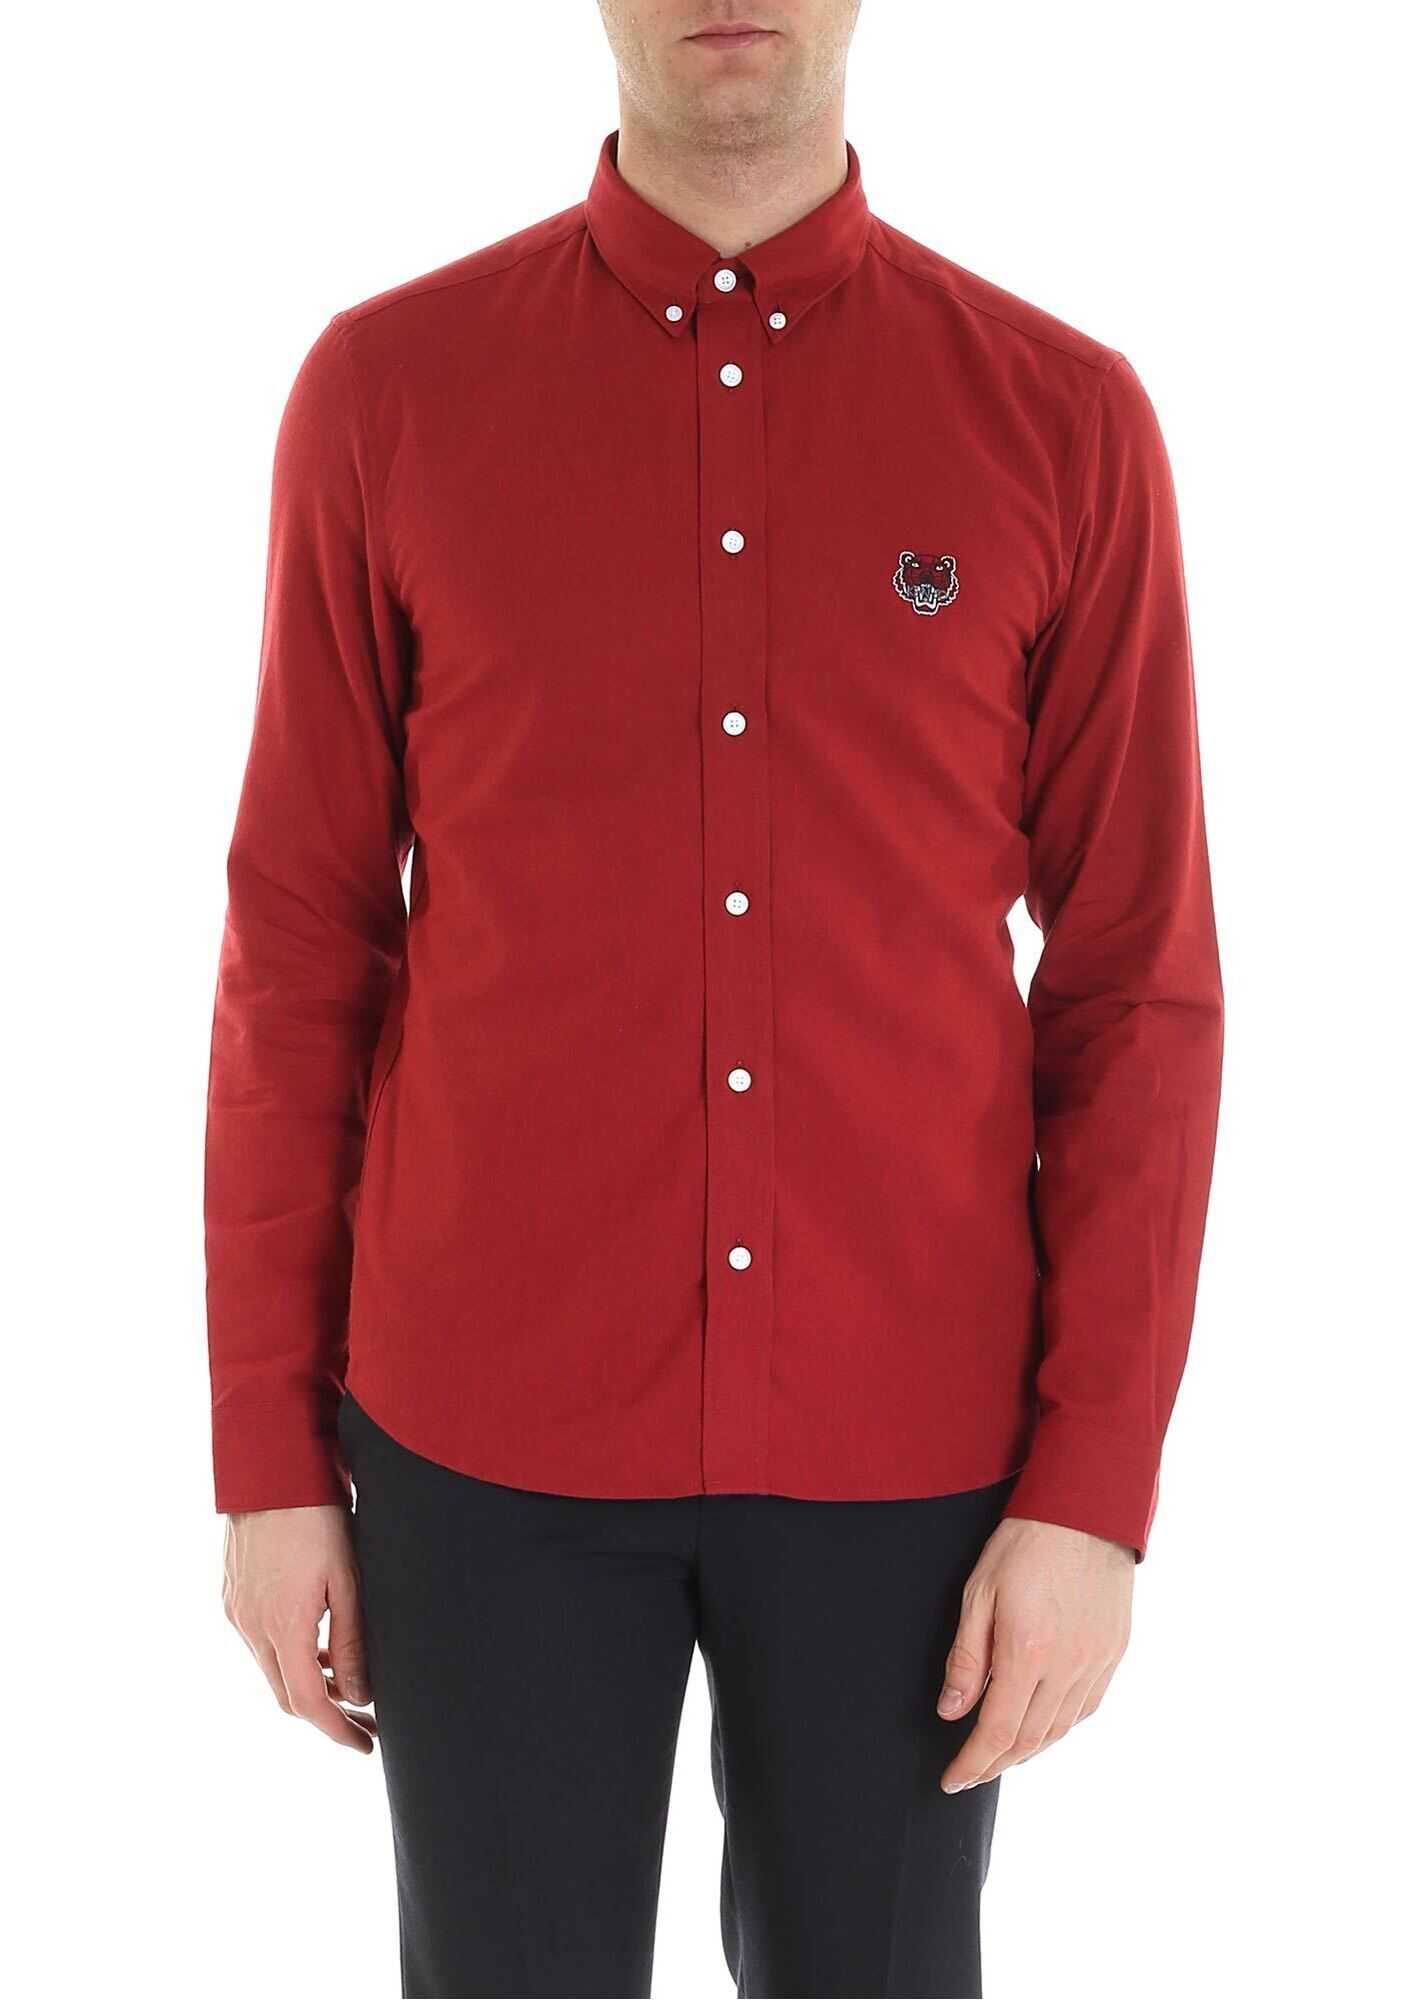 Tiger Shirt In Red thumbnail